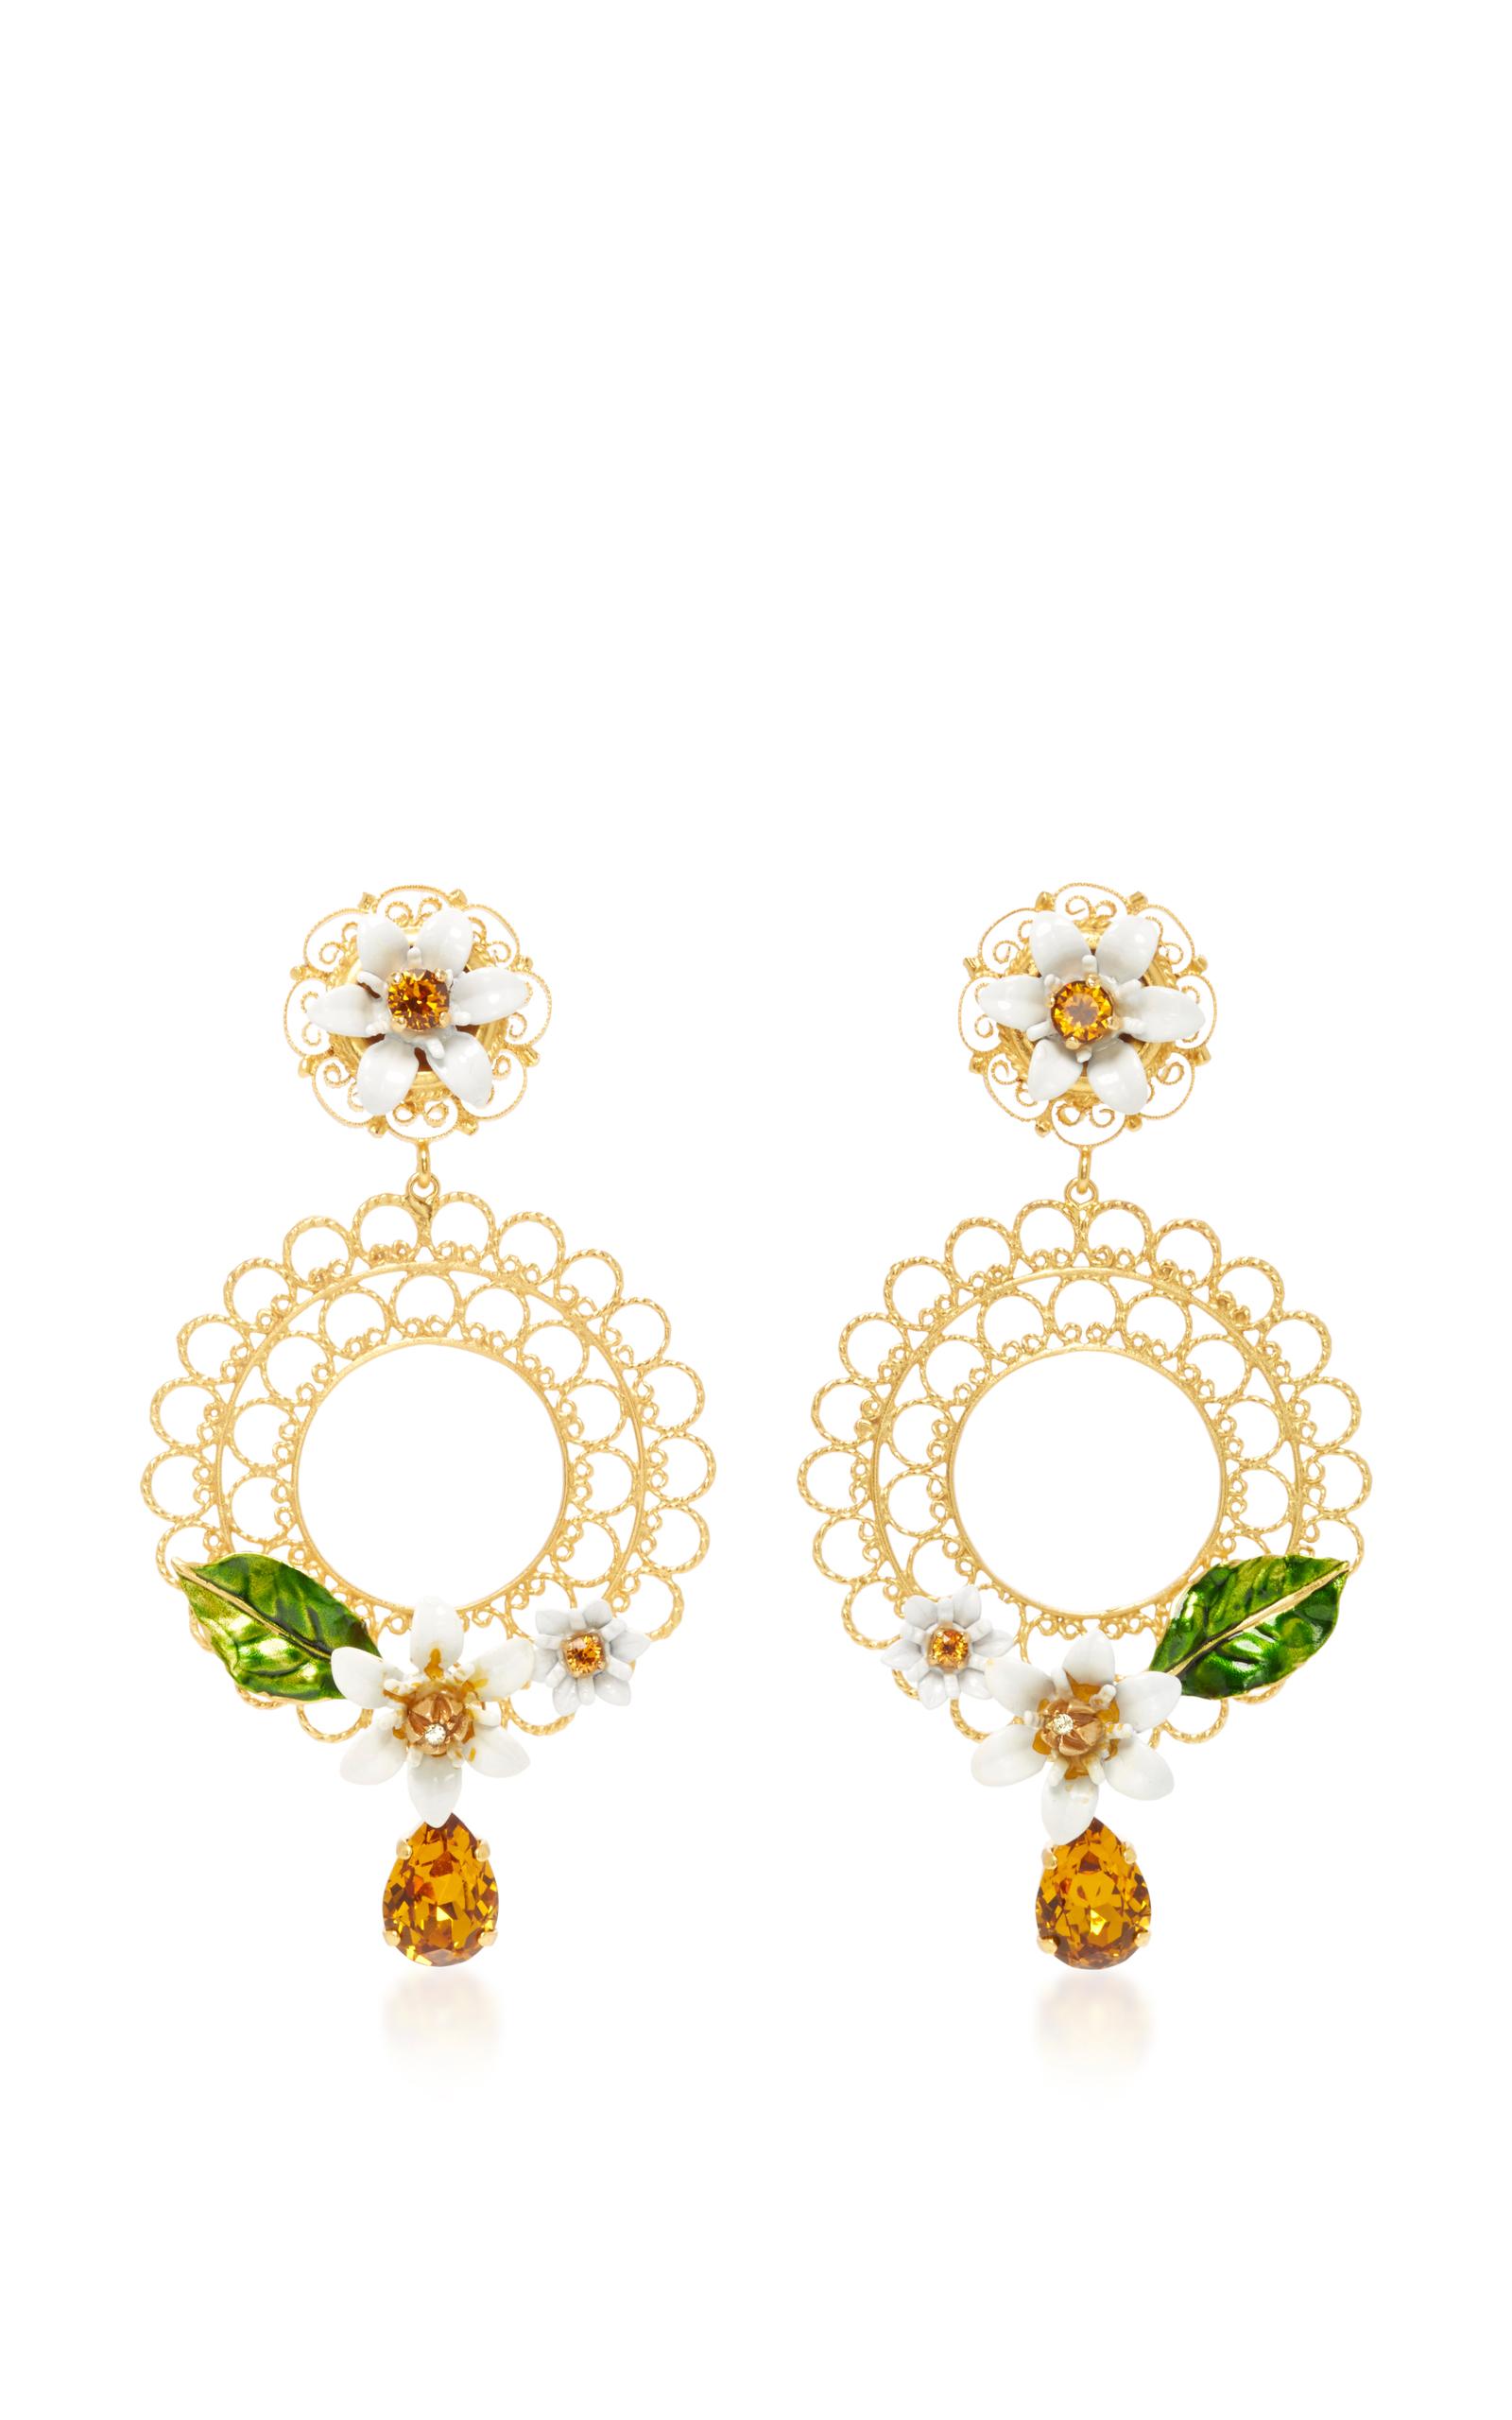 DOLCE & GABBANA Gold-Tone, Swarovski Crystal And Enamel Clip Earrings at Moda Operandi